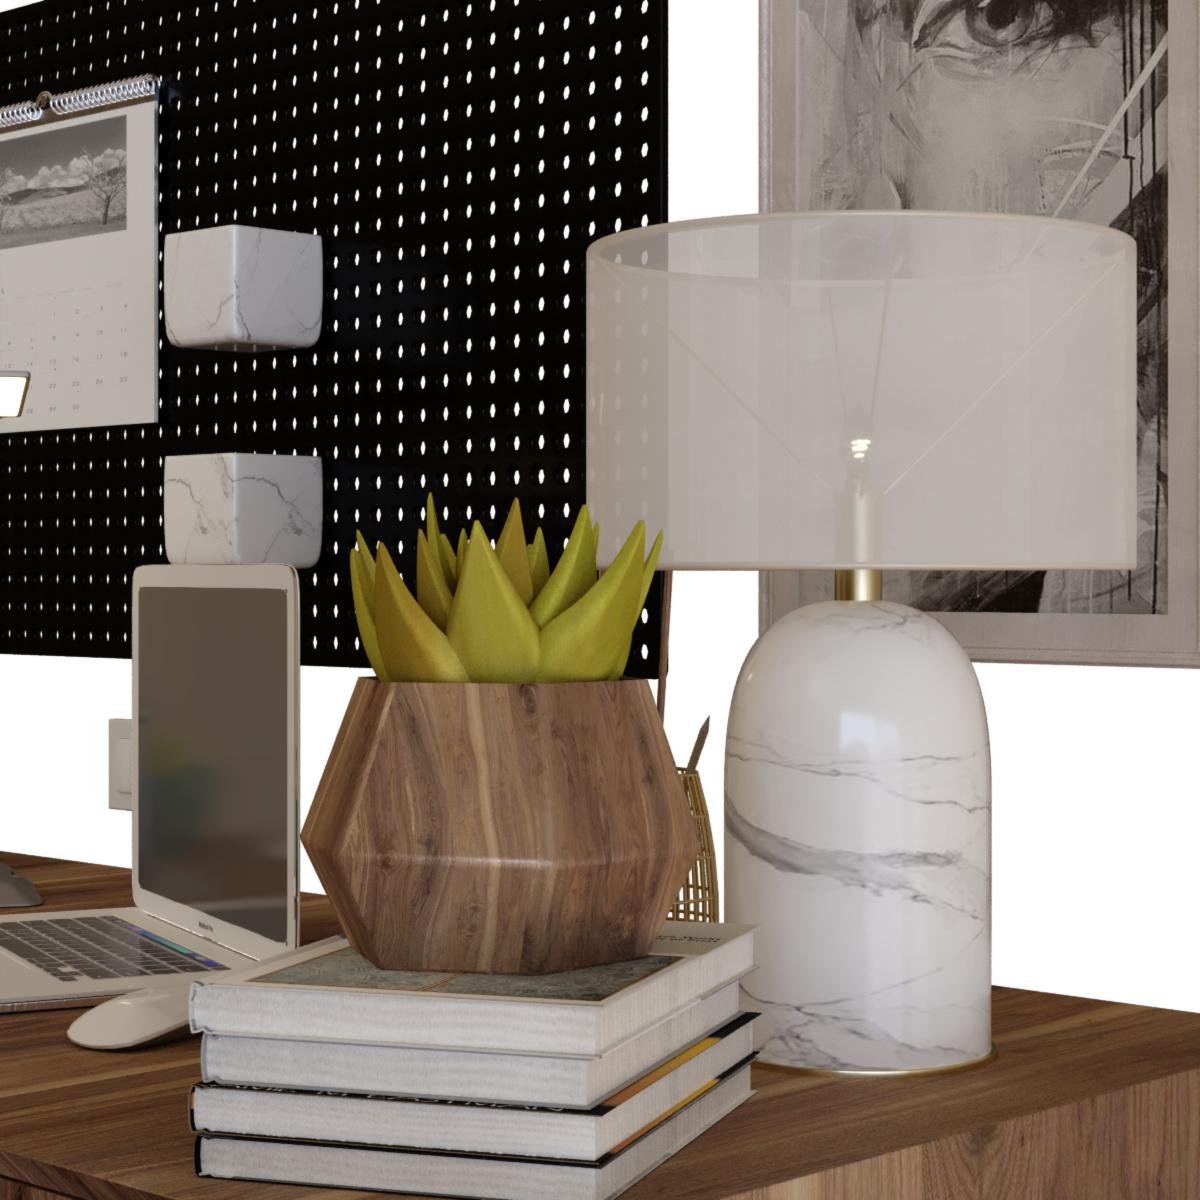 2.jpg Download STL file offfice üorkplace 3 • Design to 3D print, unisjamavari